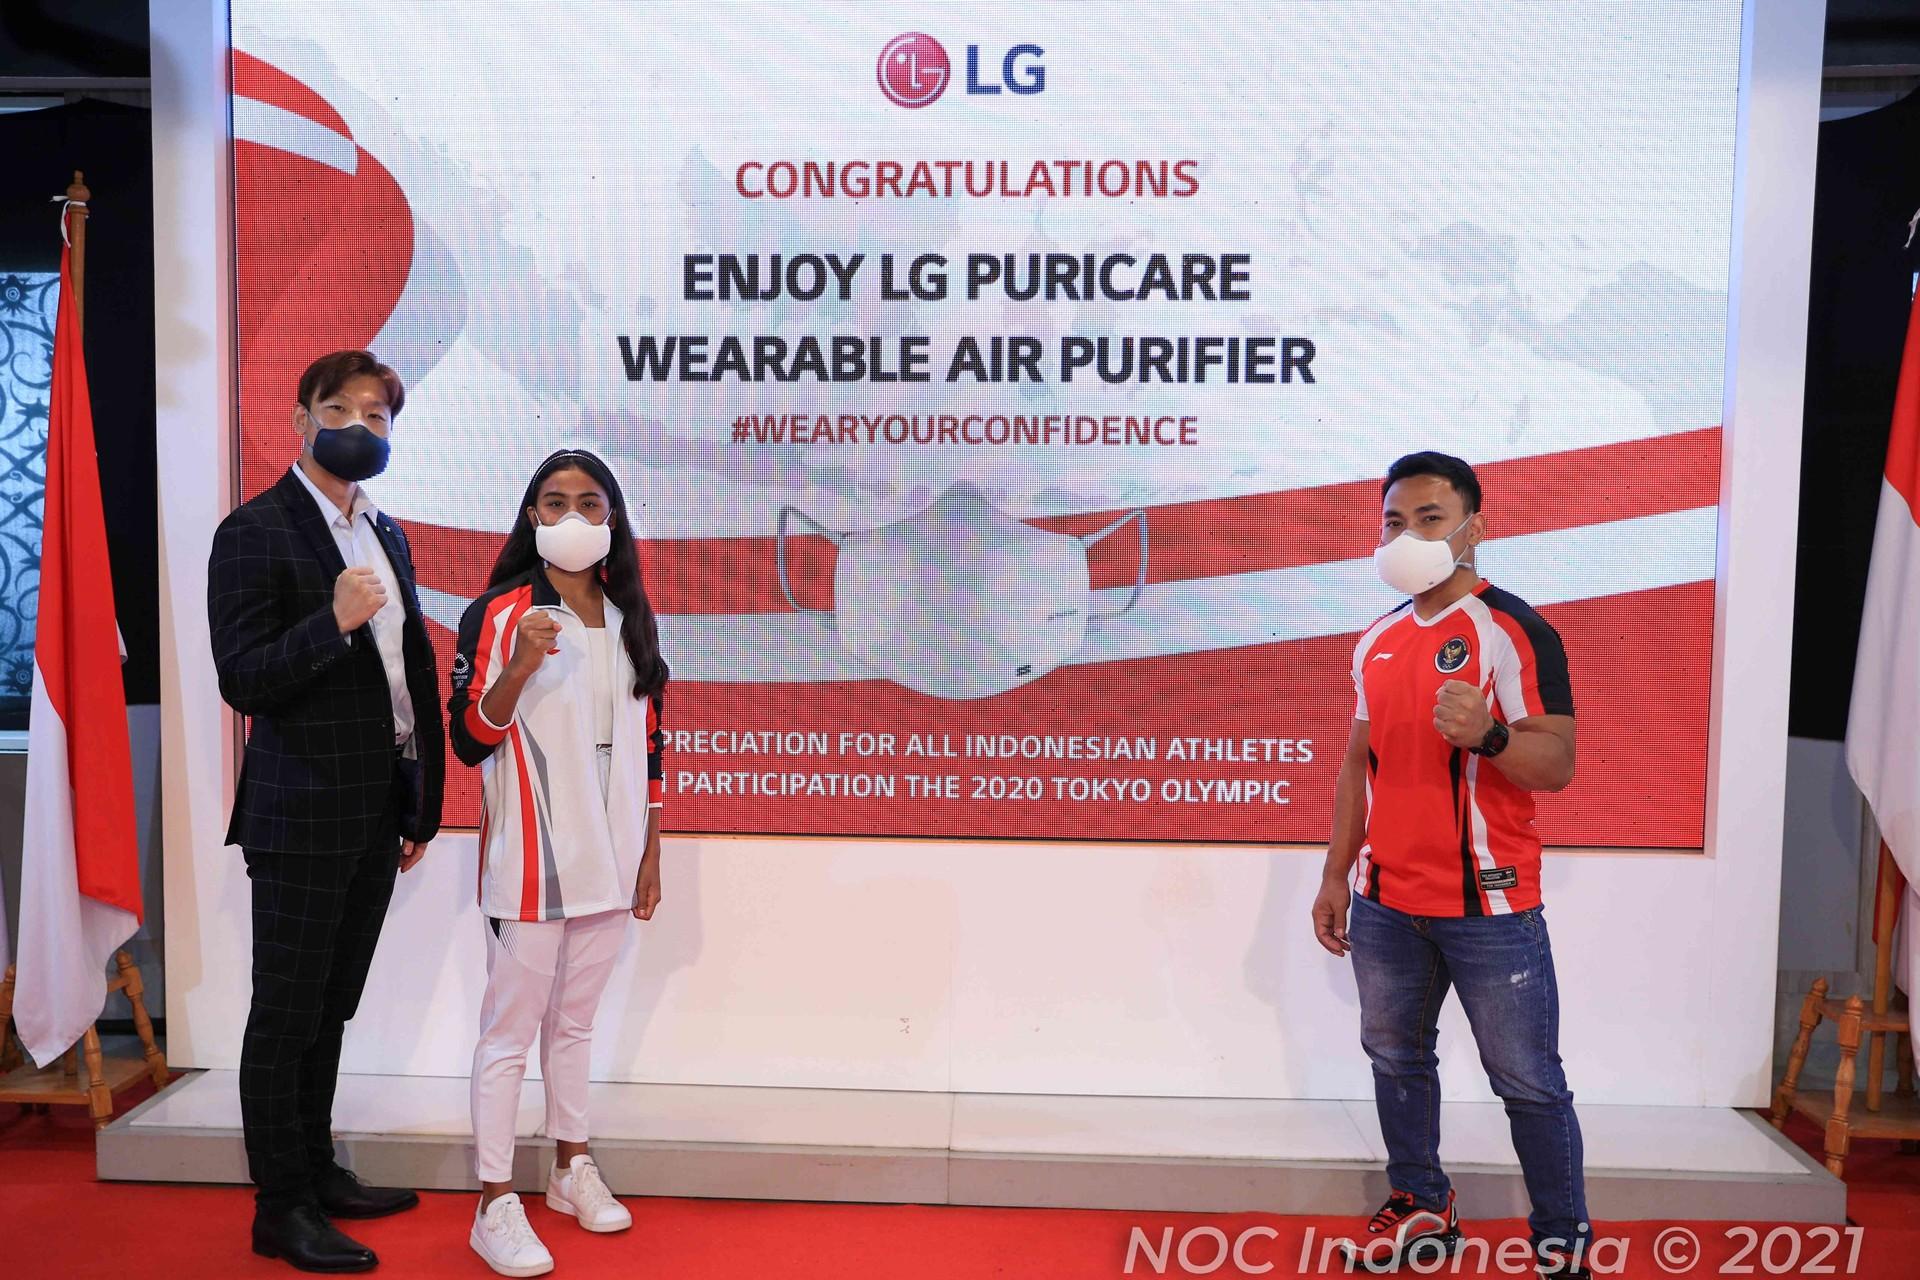 LG PuriCare Wearable Air Purifier